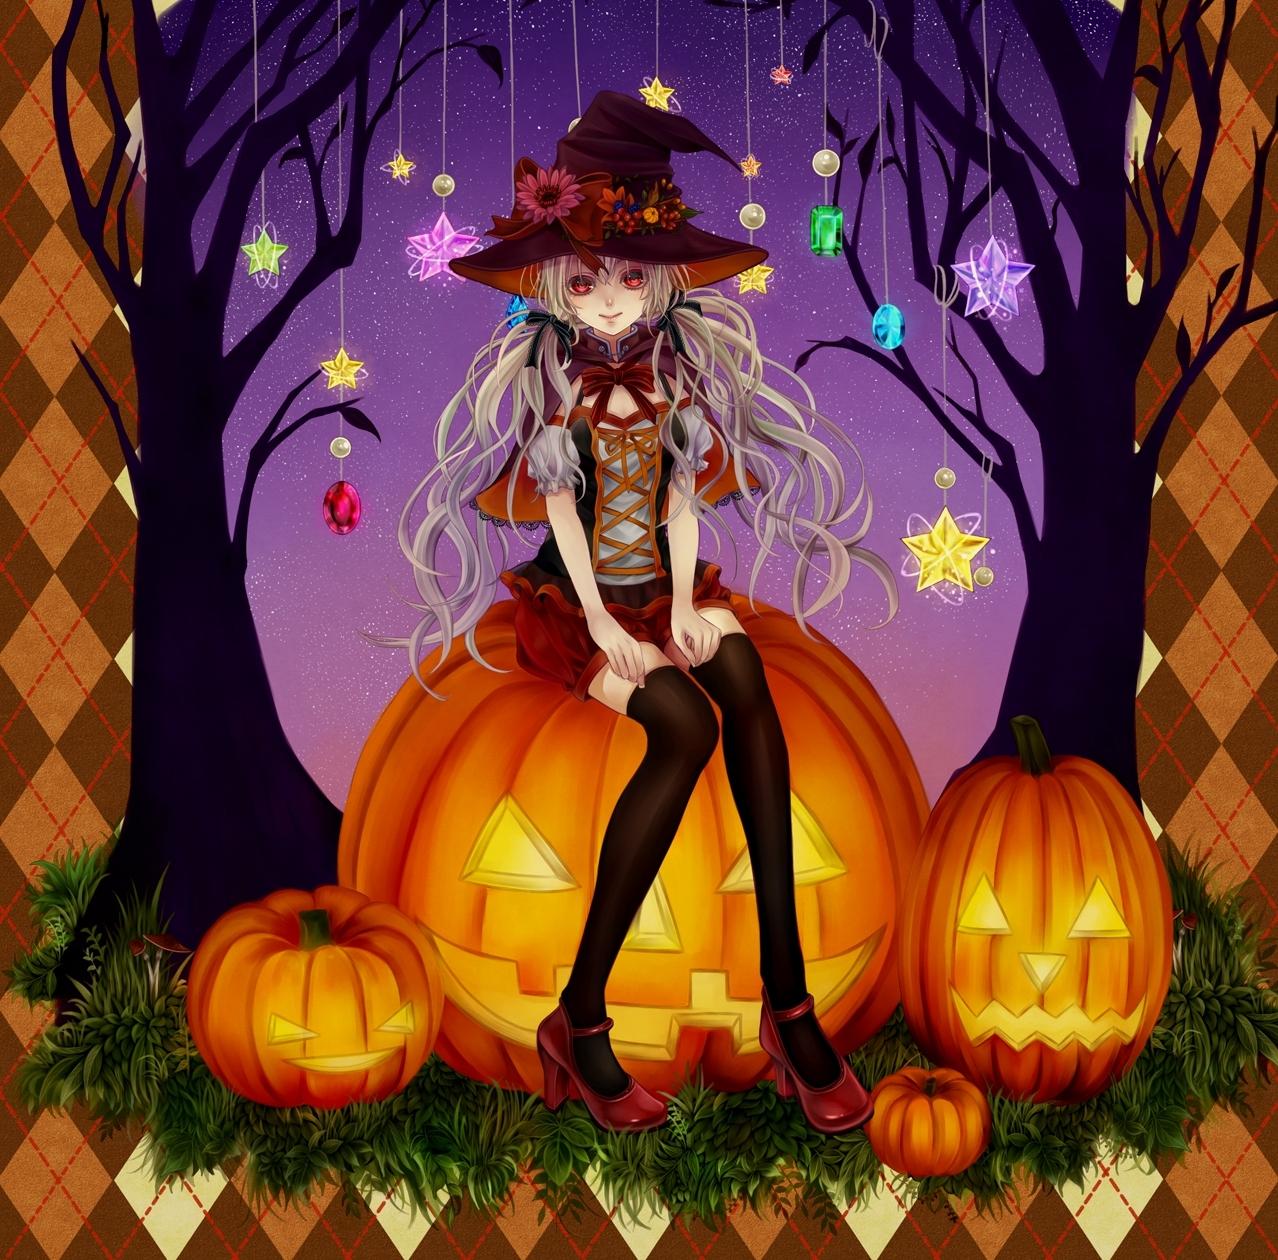 [45+] Cute Witch Halloween Wallpaper On WallpaperSafari